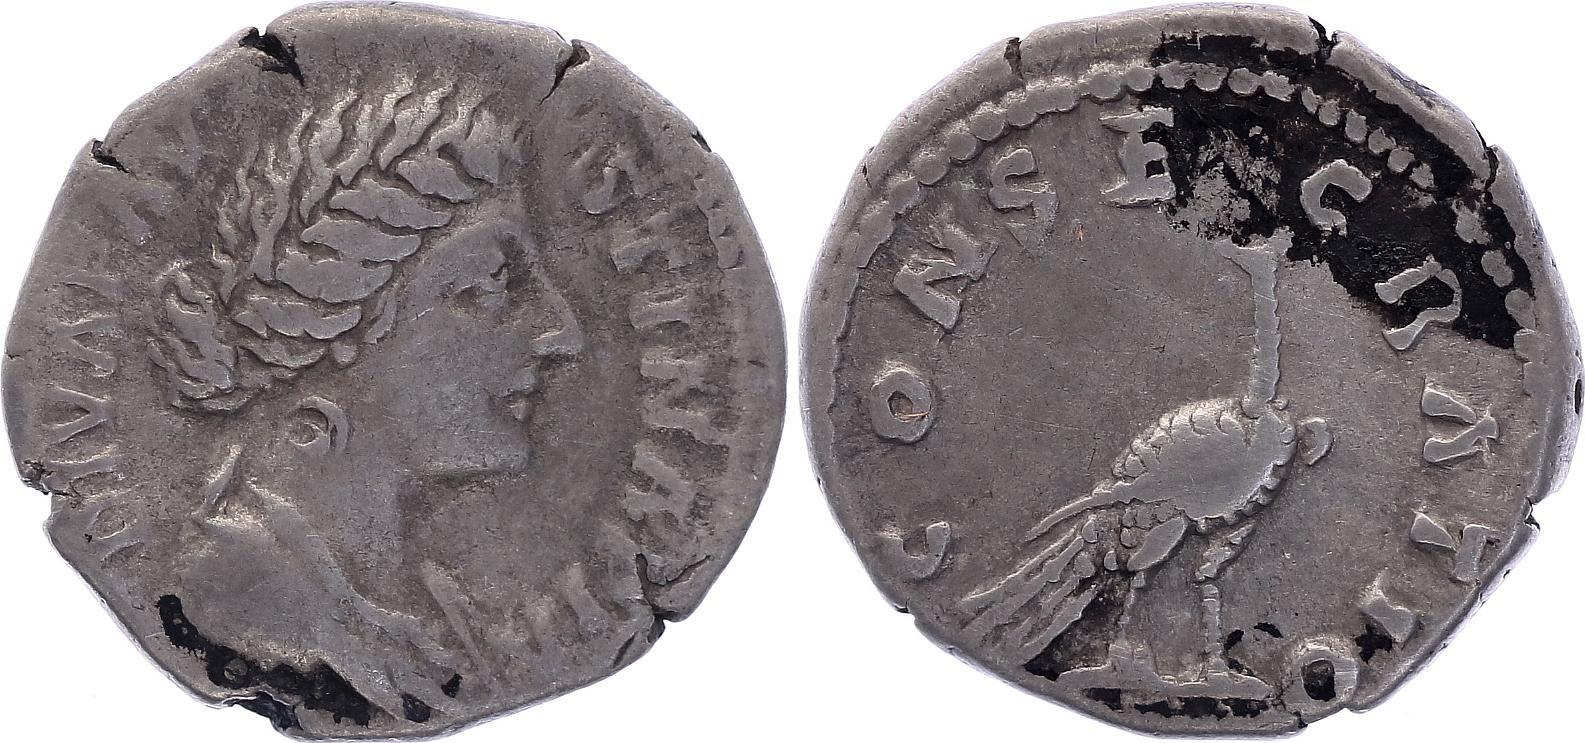 Rome Empire Denier, Diva Faustina (176-180) - CONSECRATIO